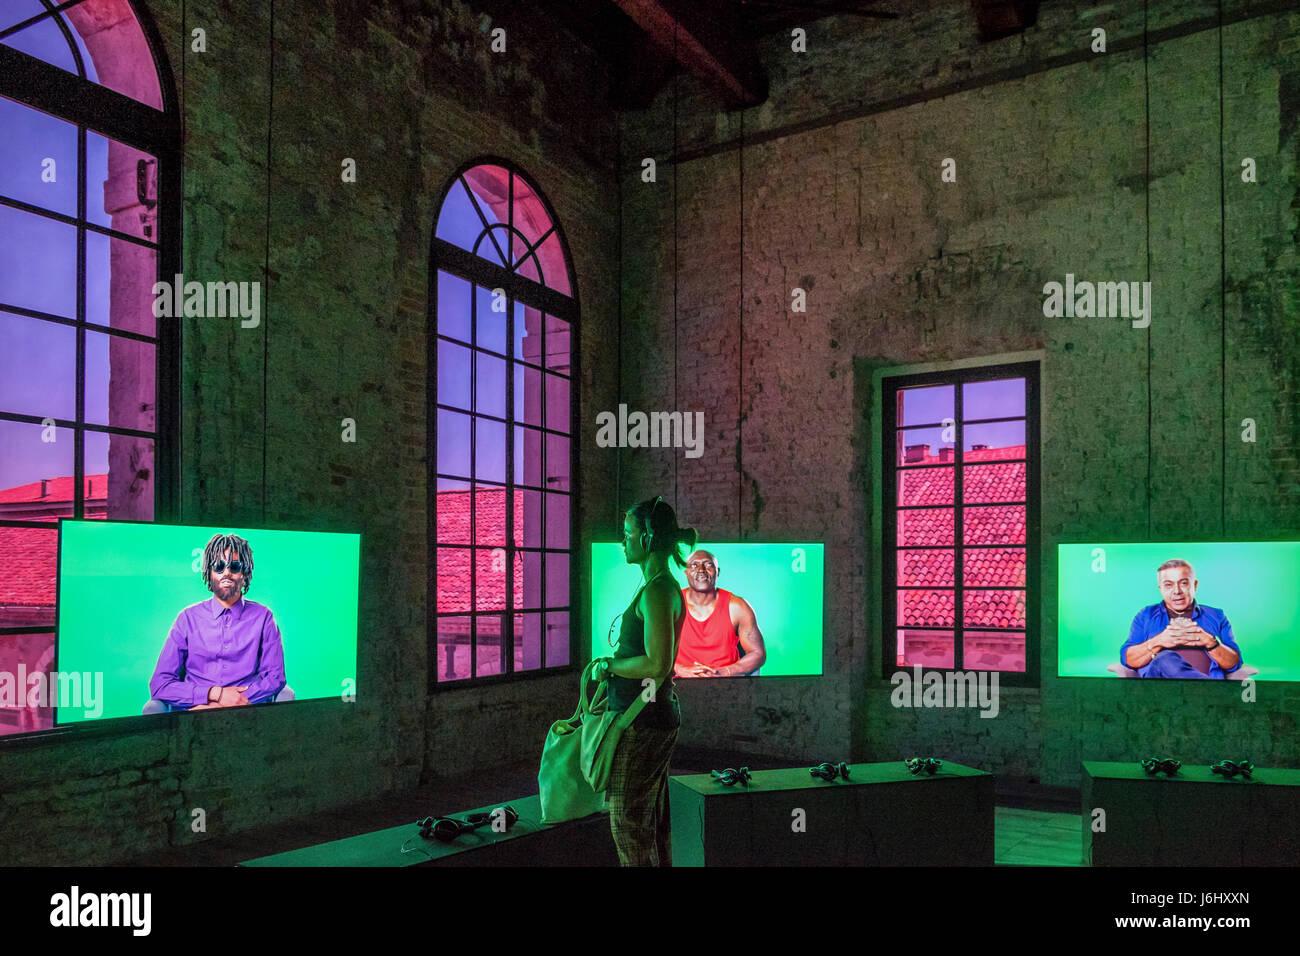 "Italy.57th Venice Biennale, La Biennale di Venezia 2017 Artist Candice Breitz artwork,'Love story"".Related by - Stock Image"